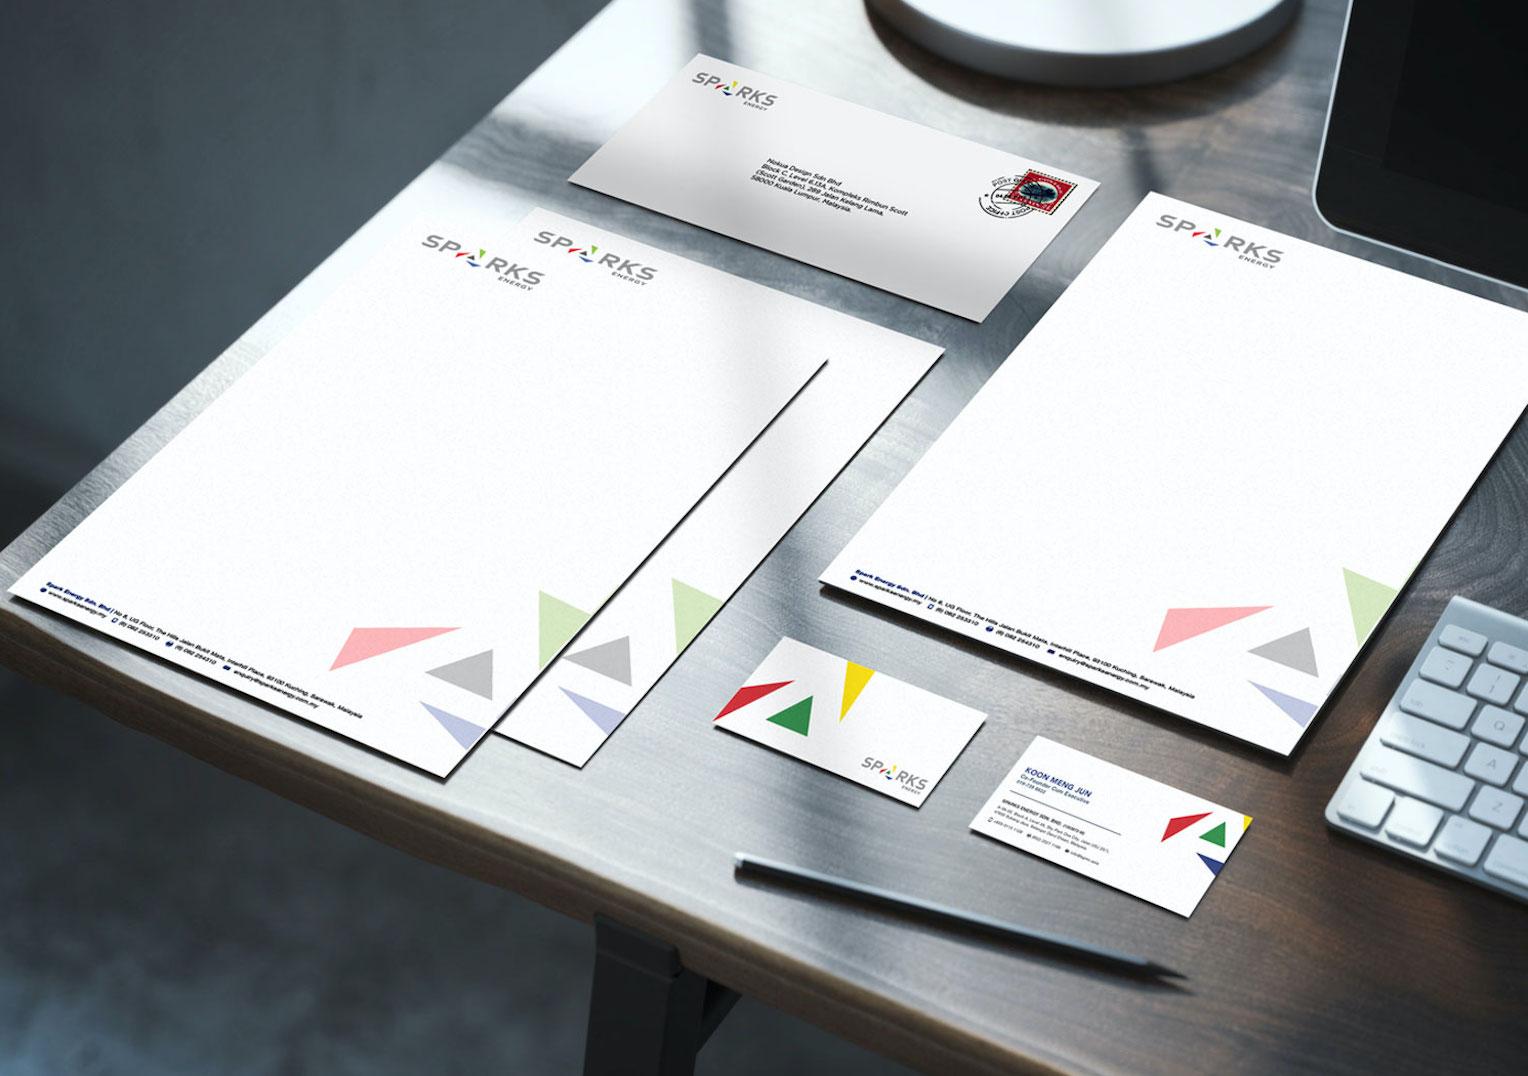 Sparks Energy | Branding & Corporate Identity Design by Nokua Design